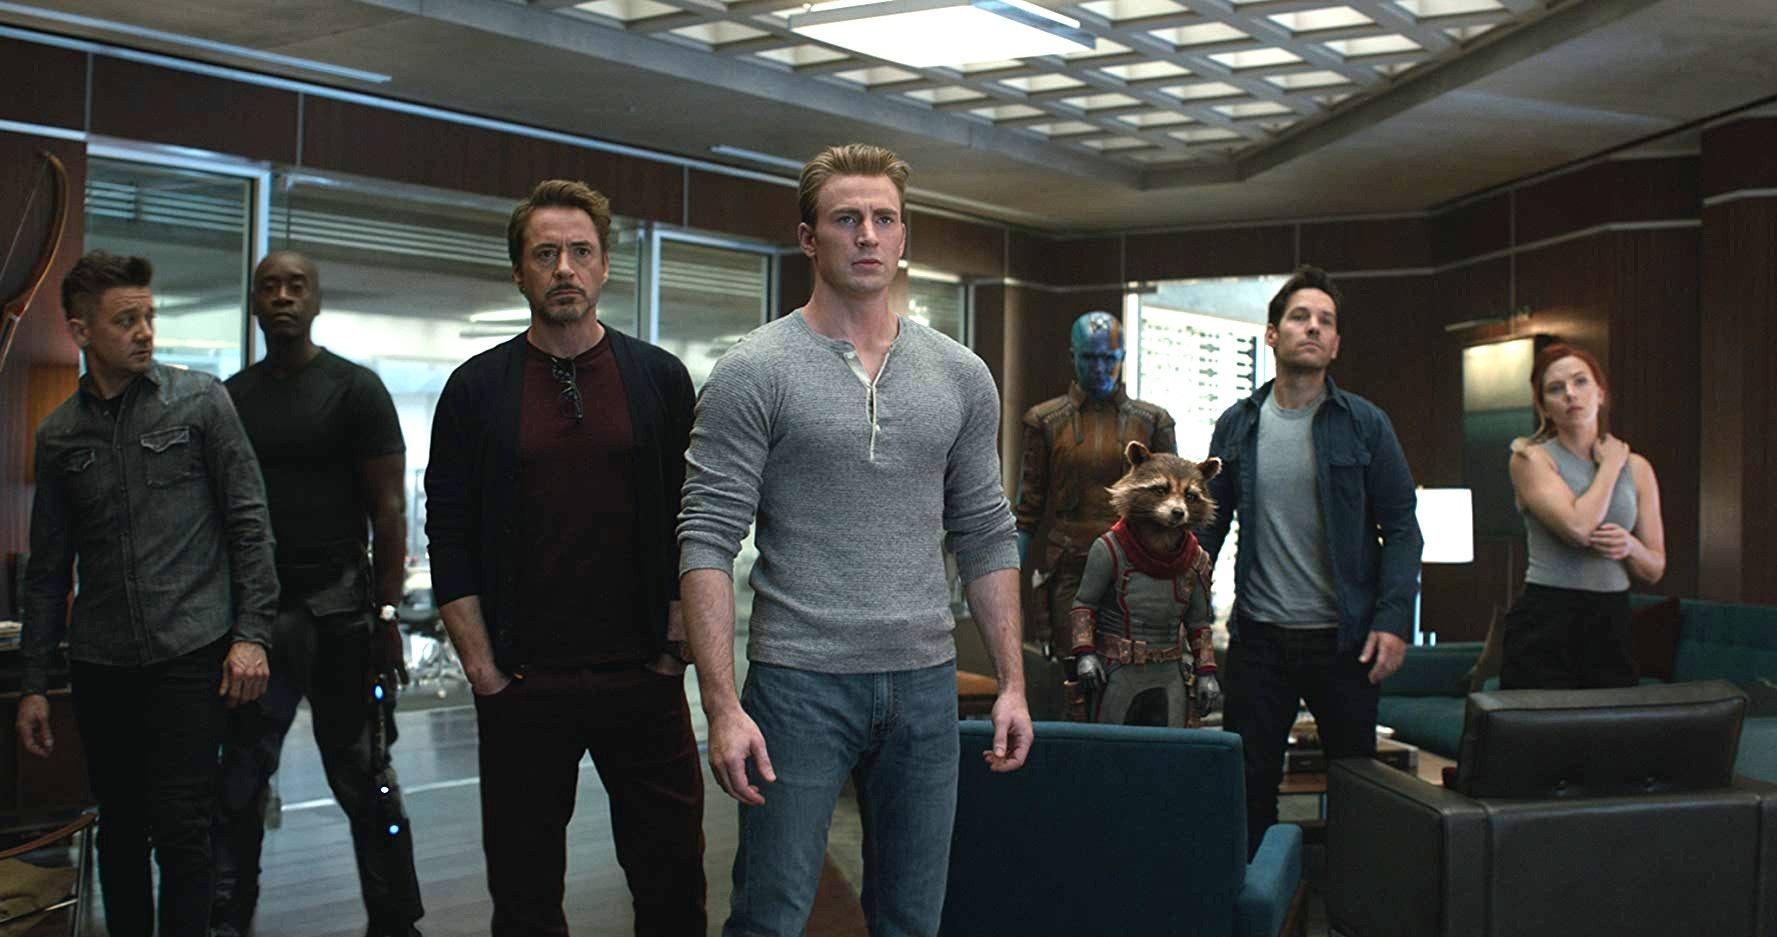 Still of Hawkeye, Rhodey, Iron Man, Captain America, Rocket, Nebula, Ant-Man and Black Widow in 'Avengers: Endgame'